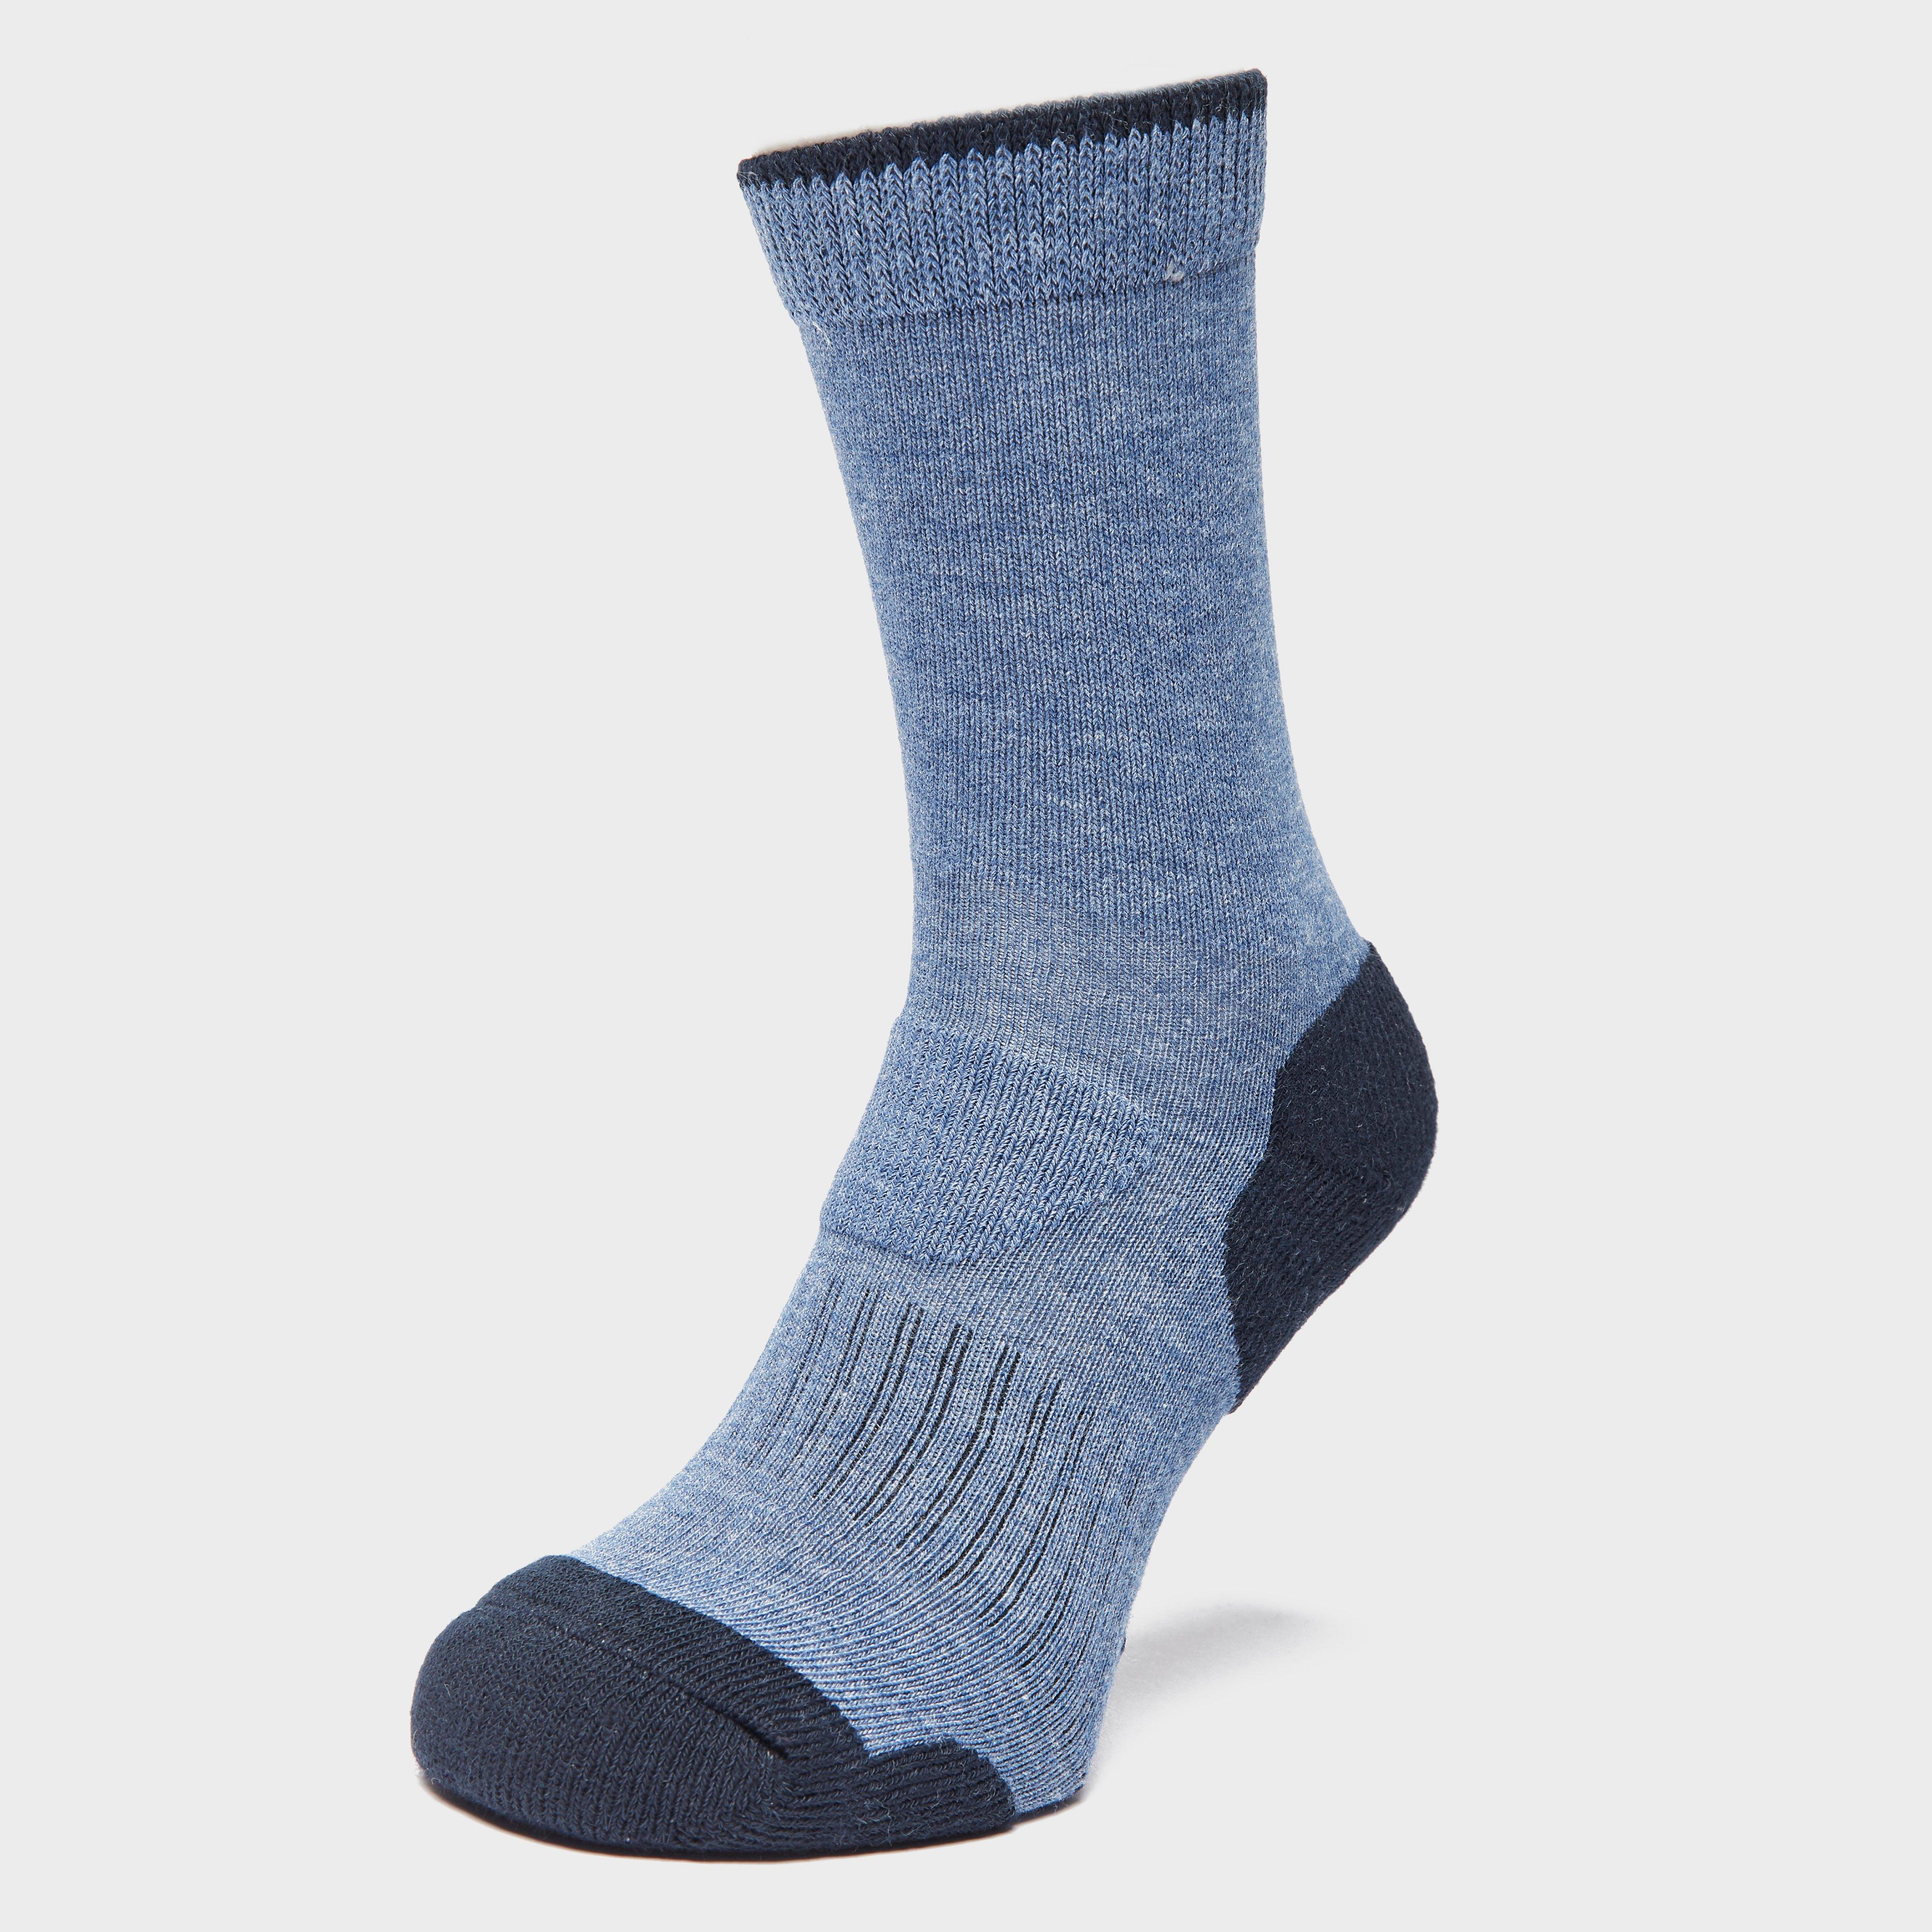 Brasher Womens Light Hiker Socks - Blue/blu  Blue/blu